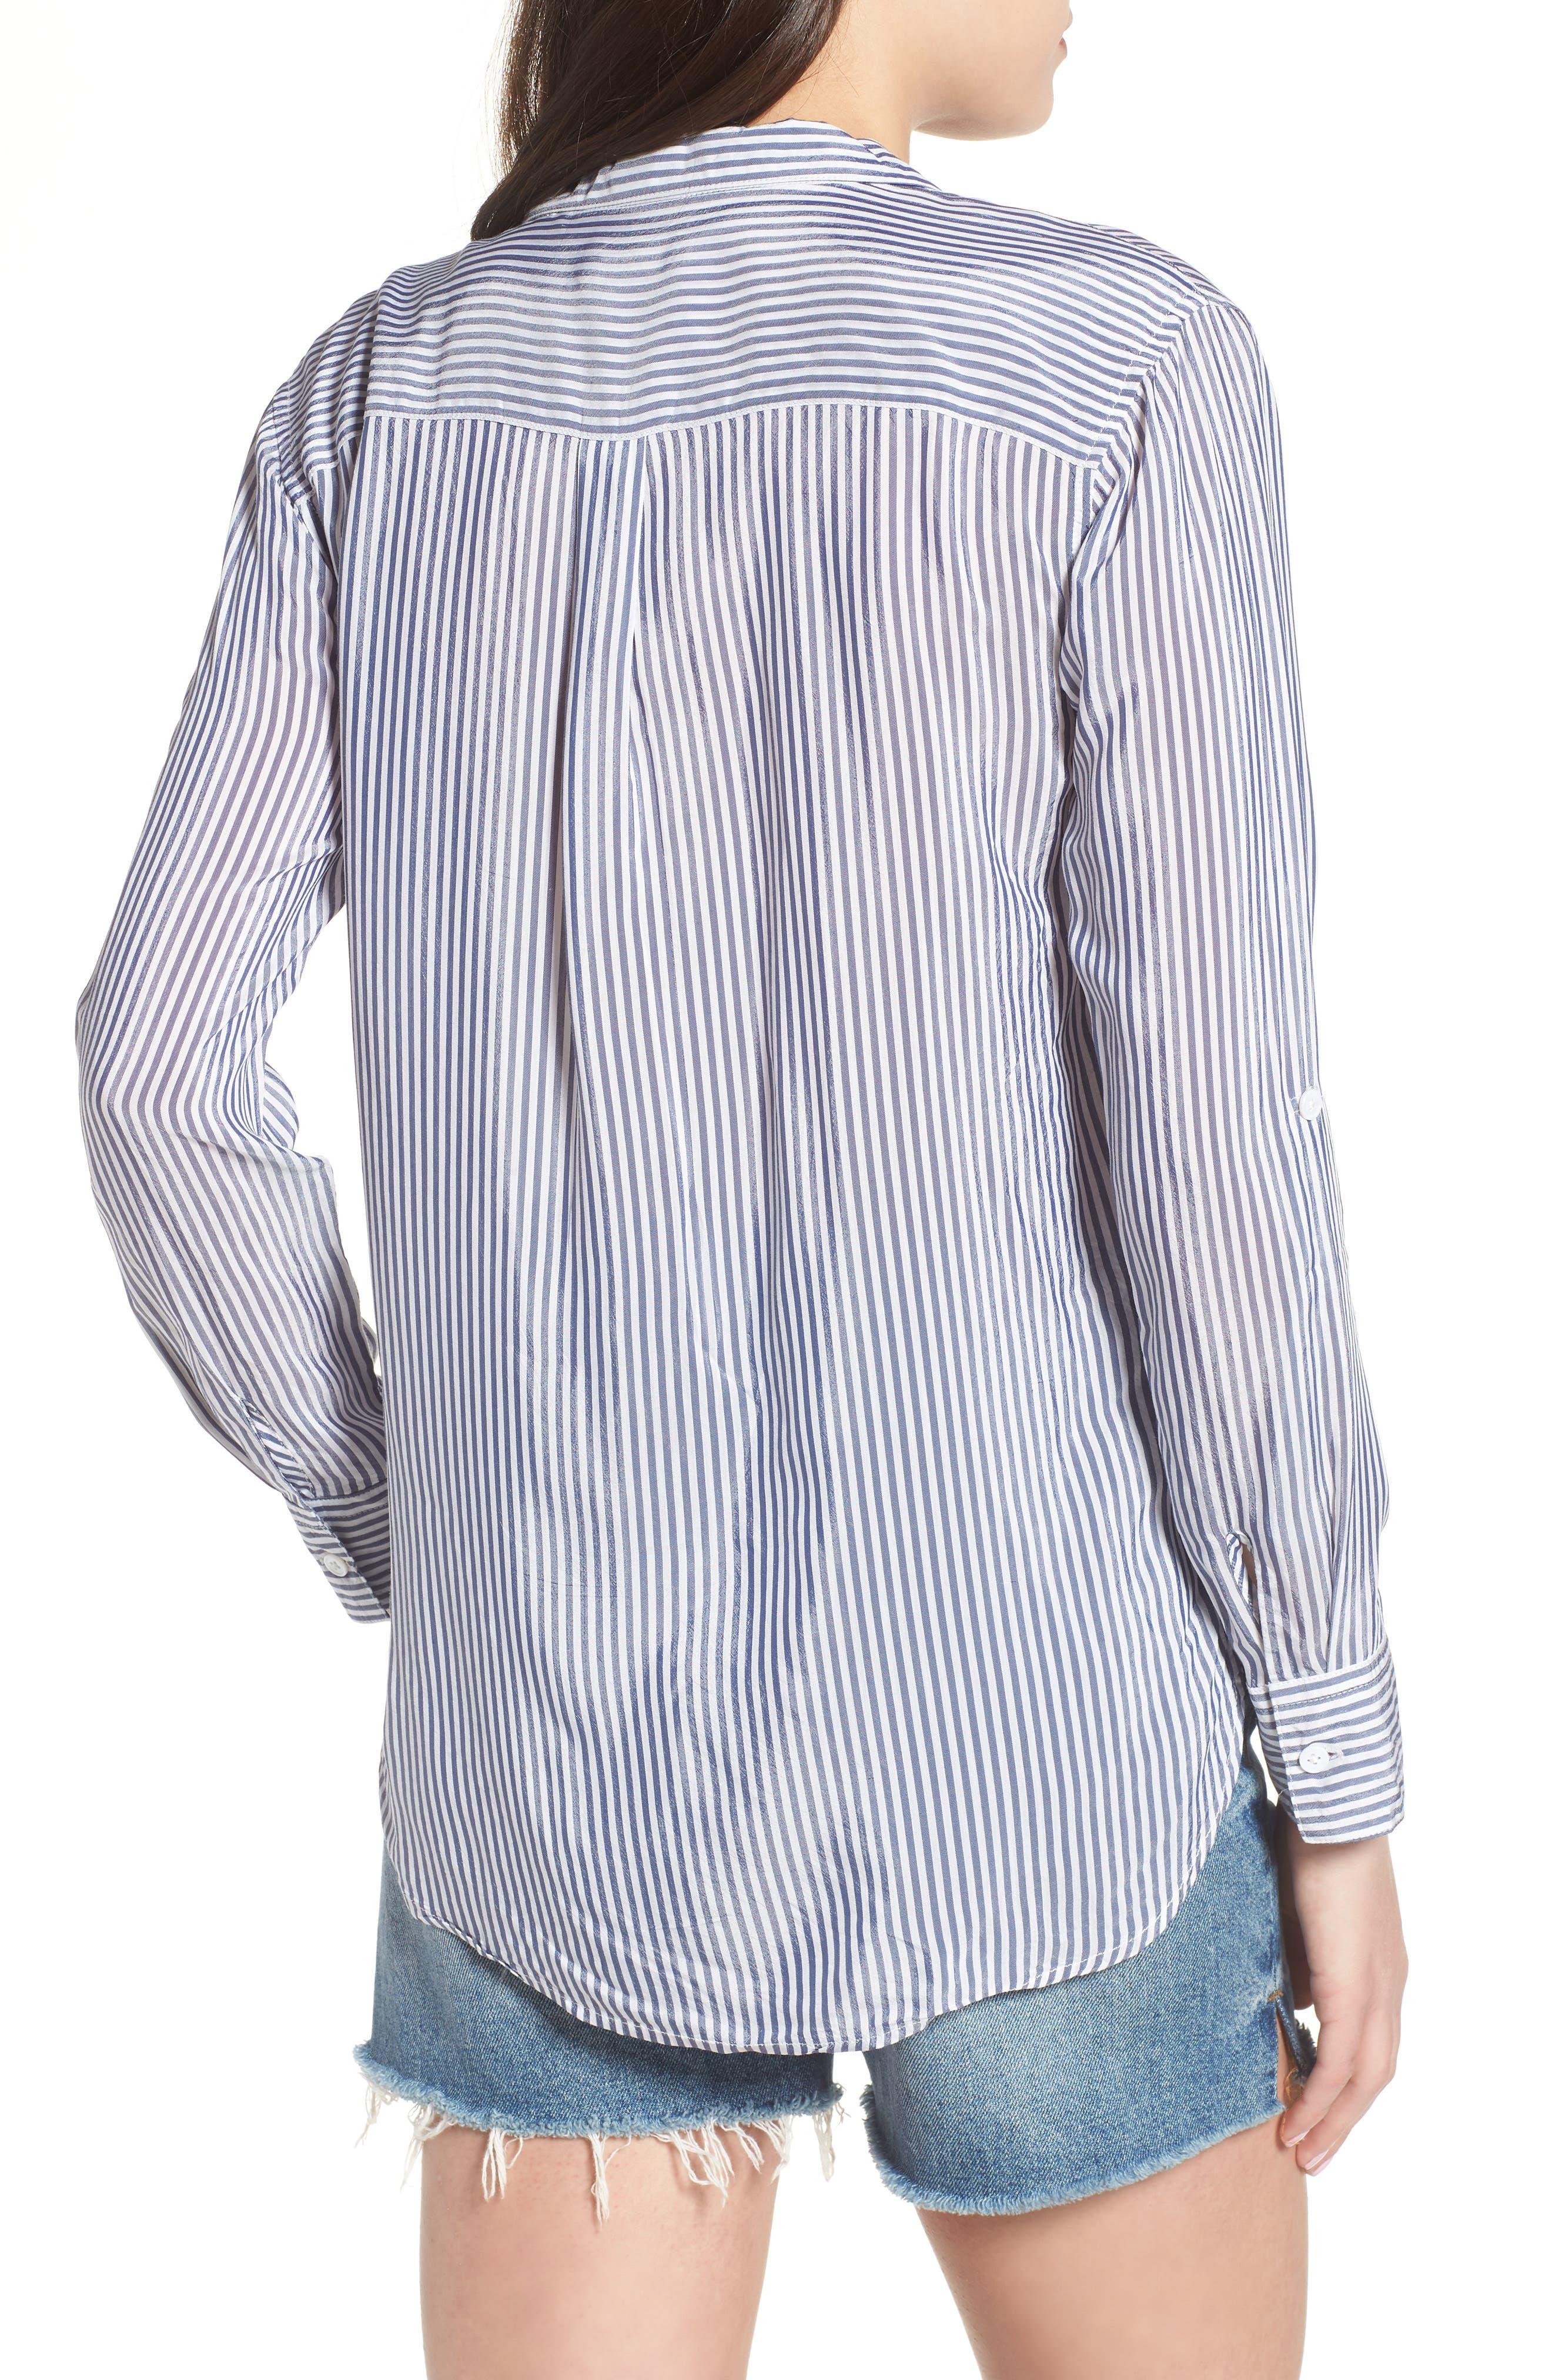 Zinc Stripe Shirt,                             Alternate thumbnail 2, color,                             Blue Stripe